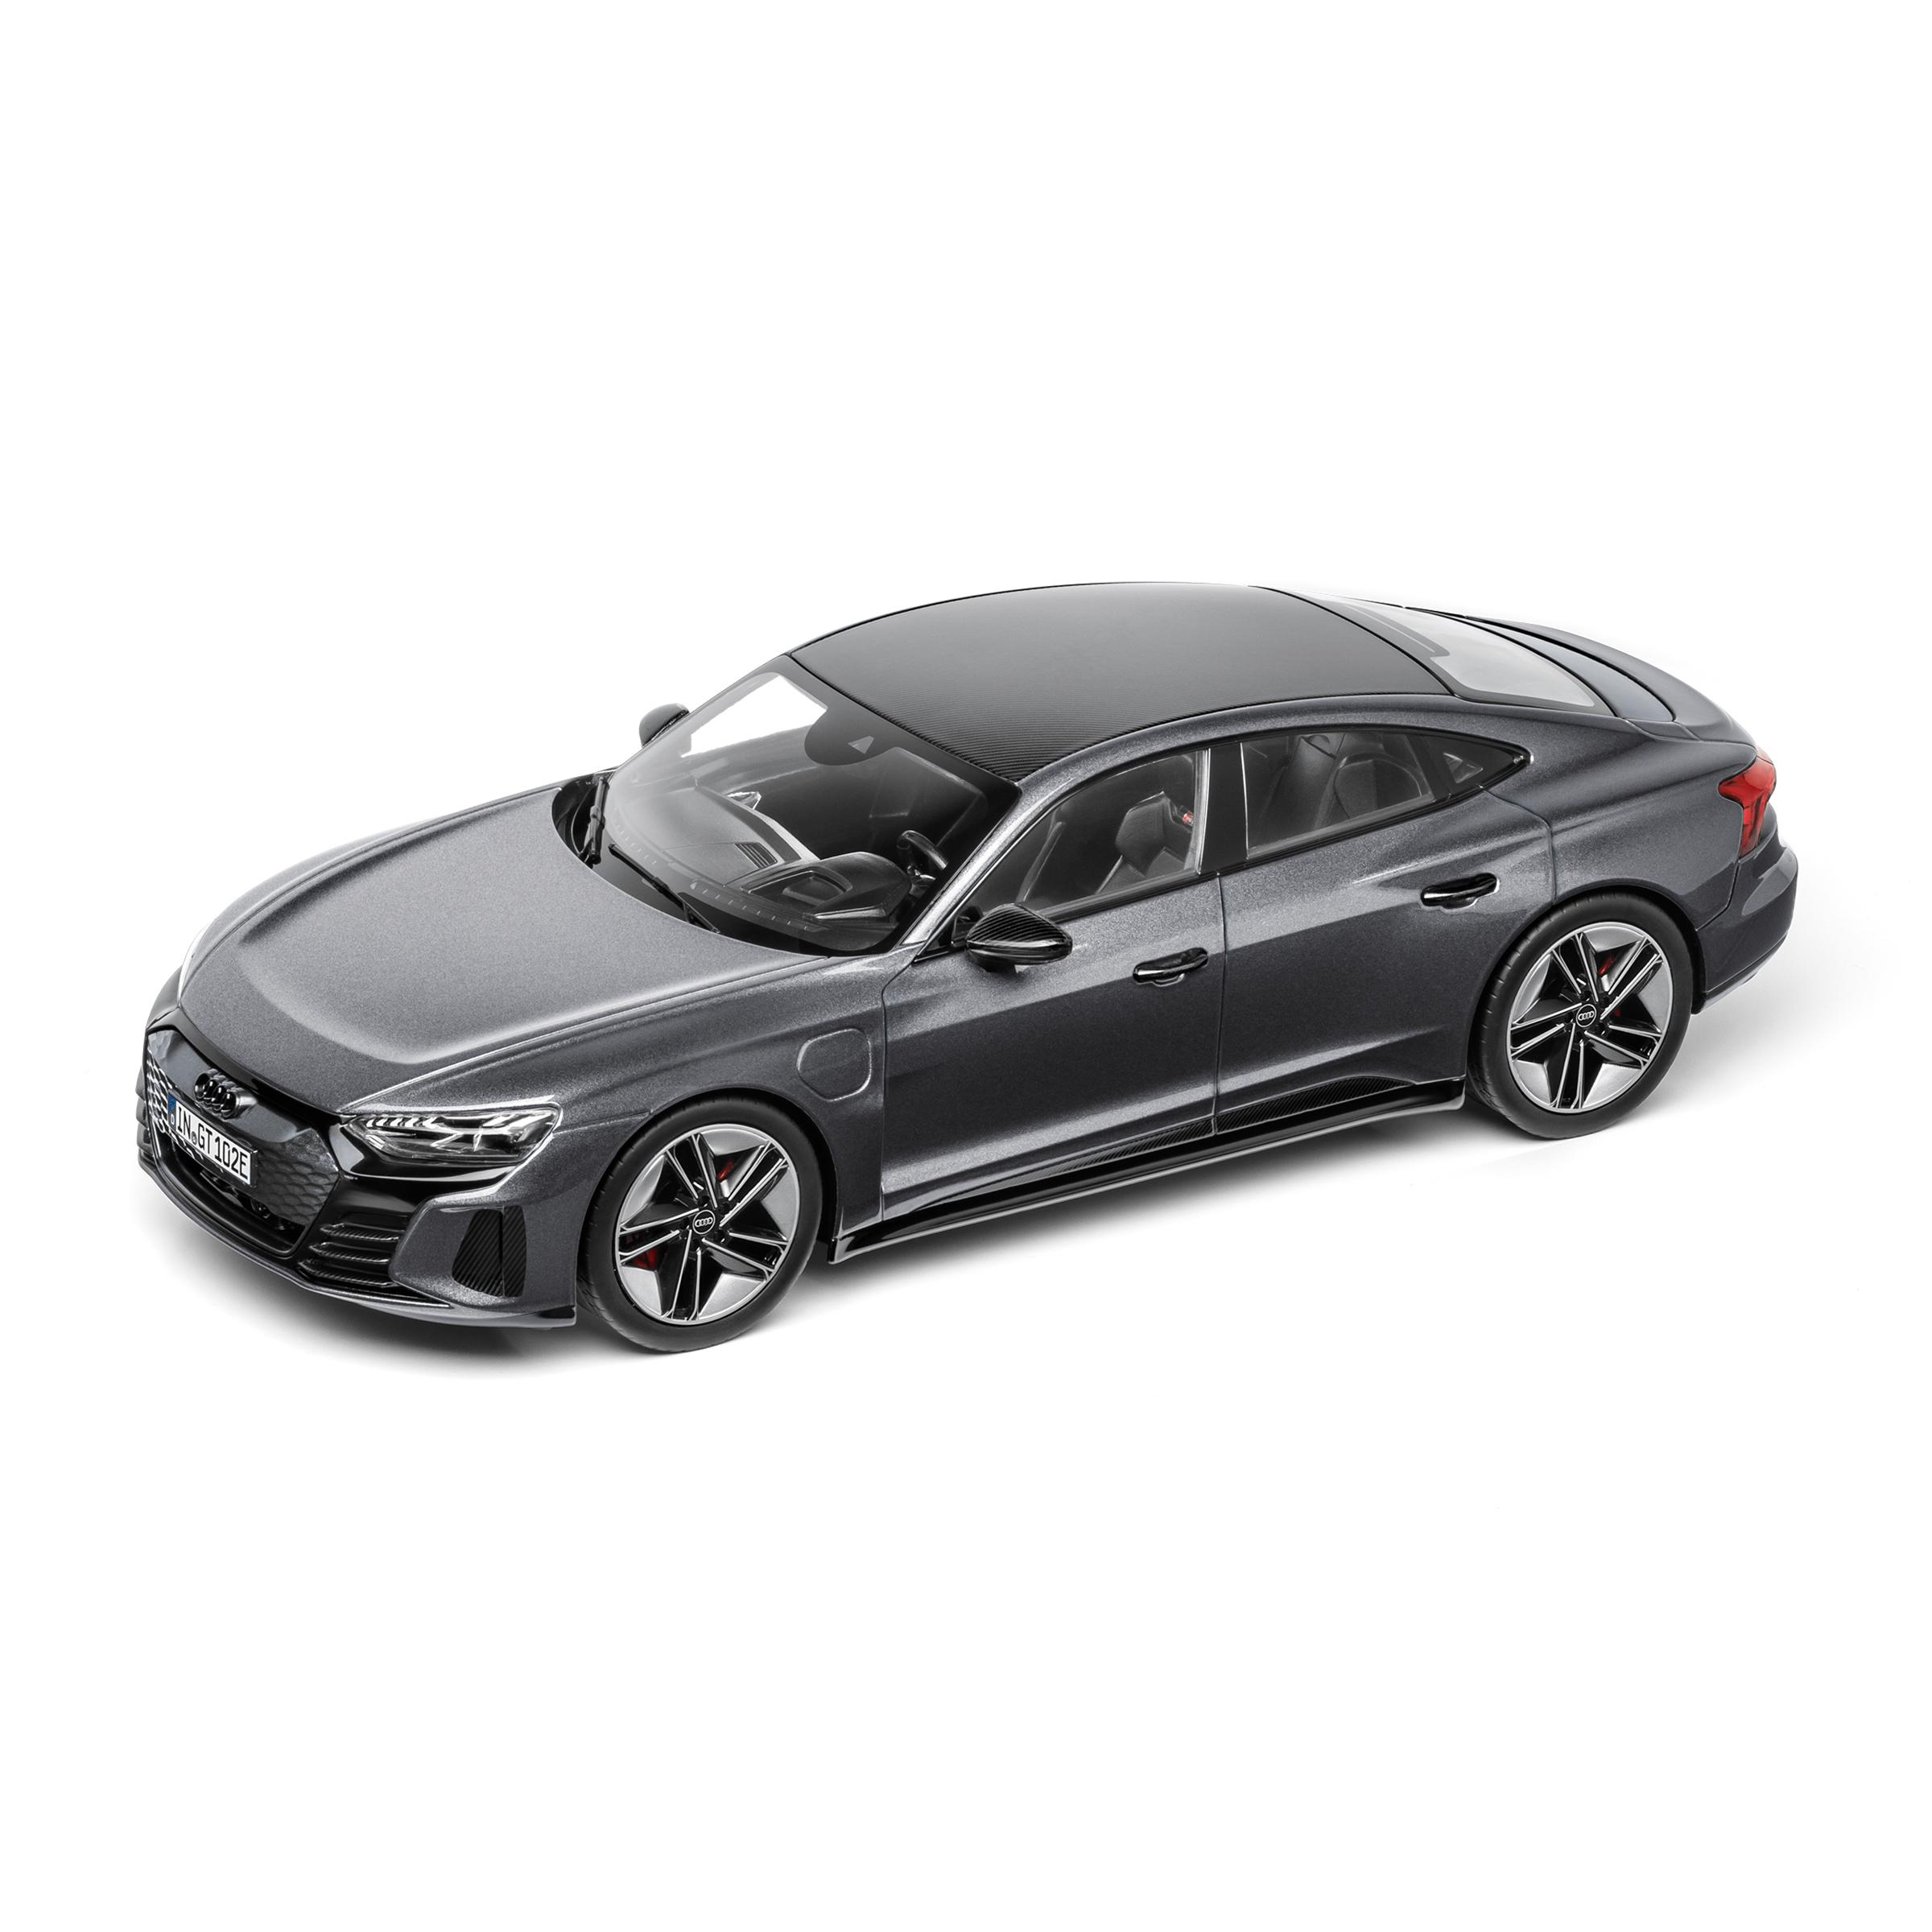 Audi RS e-tron GT Daytonagrau Modellauto 1:18